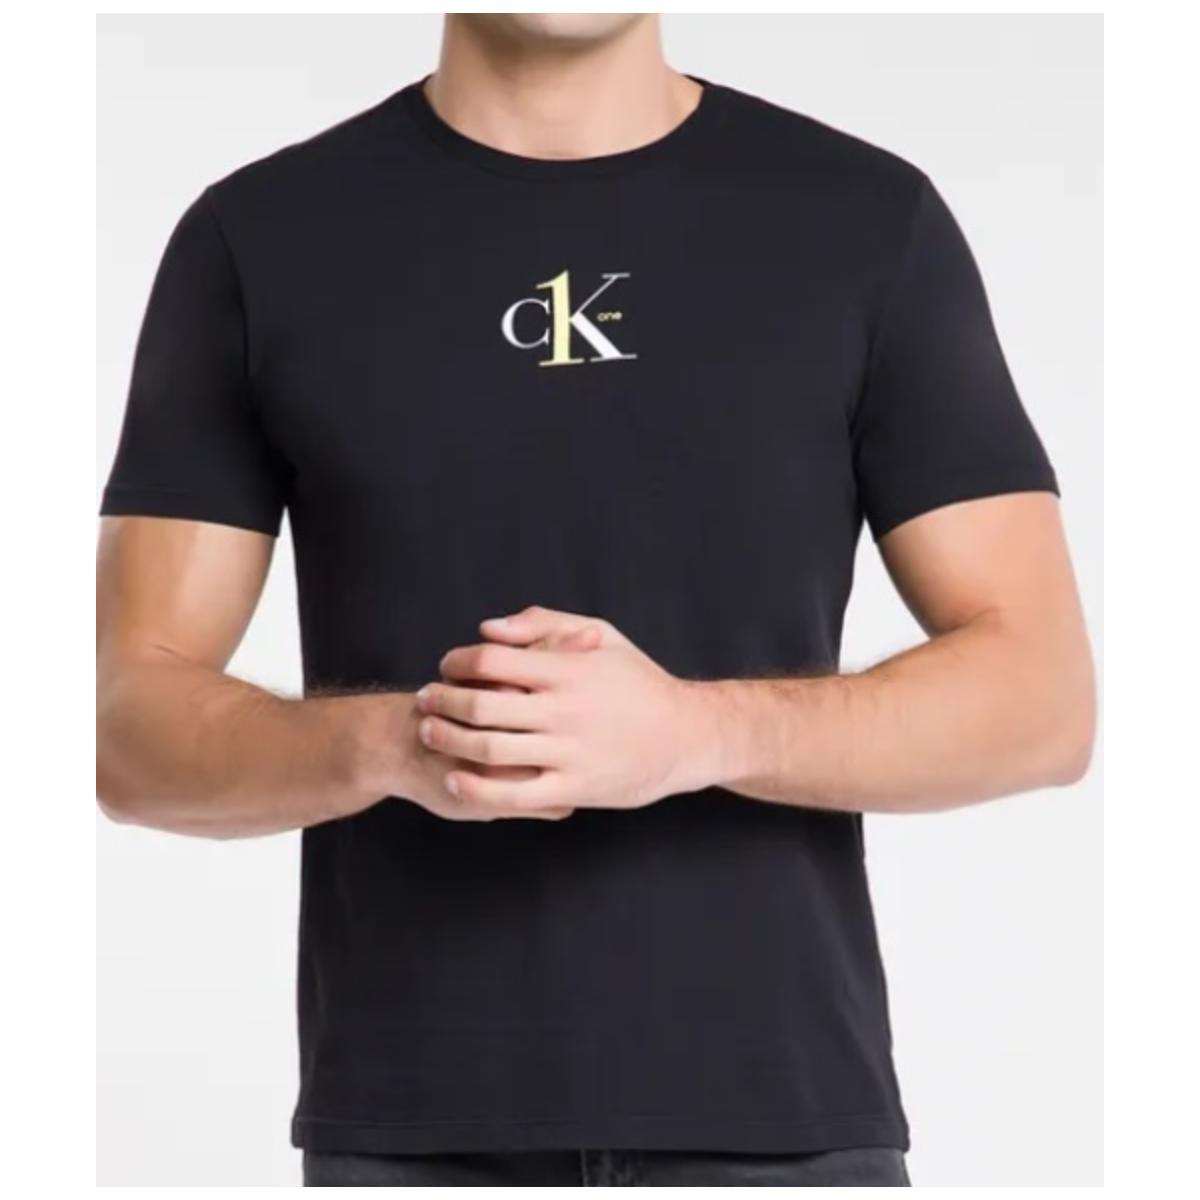 Camiseta Masculina Calvin Klein Cm0ok01tc020 Preto